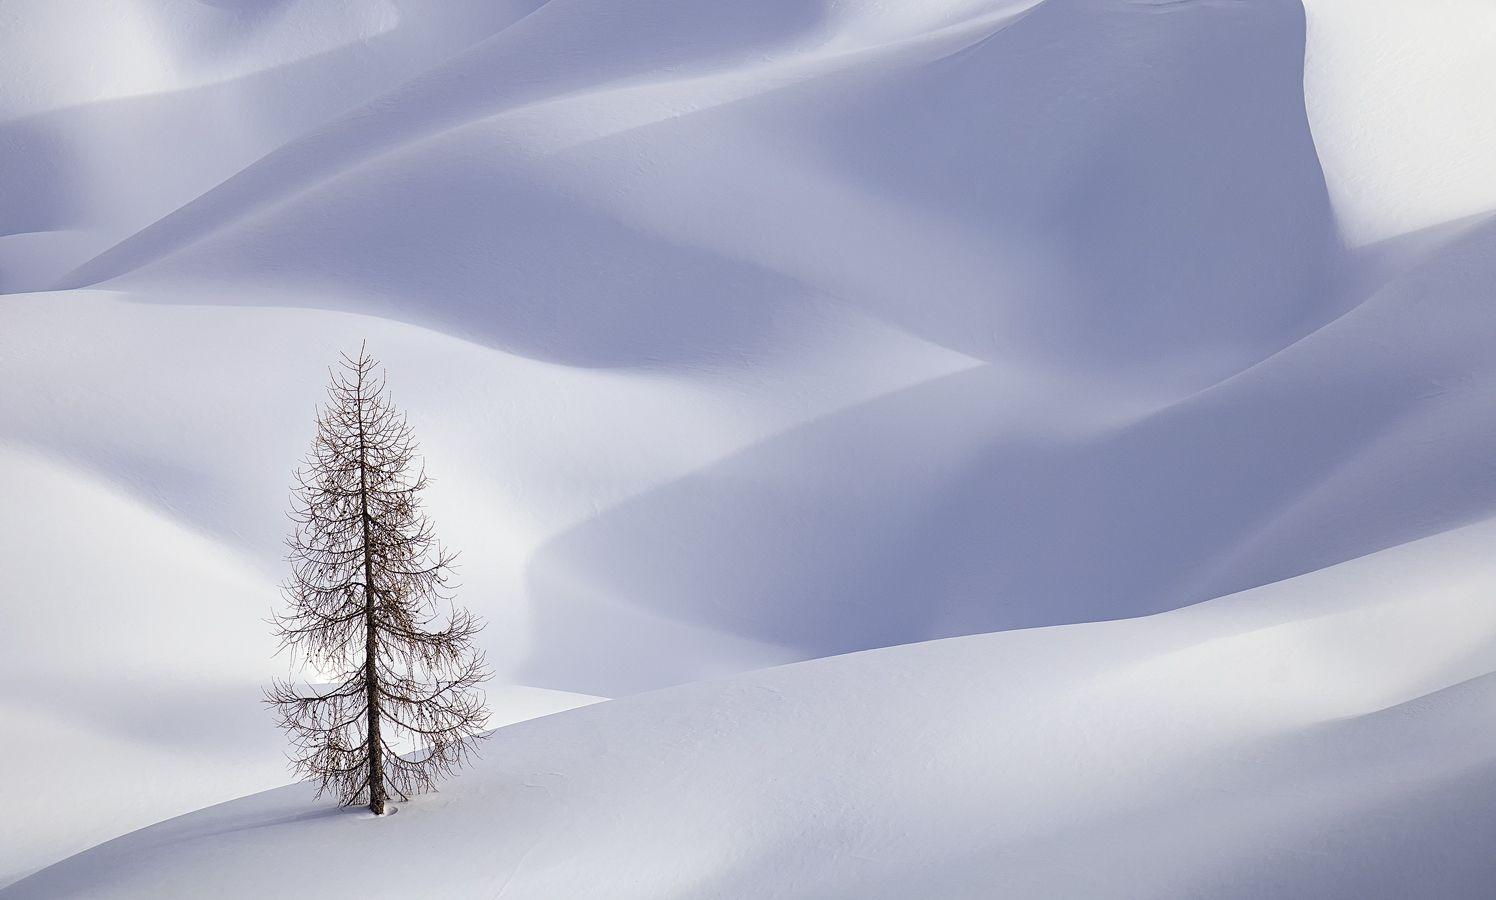 The snow powder